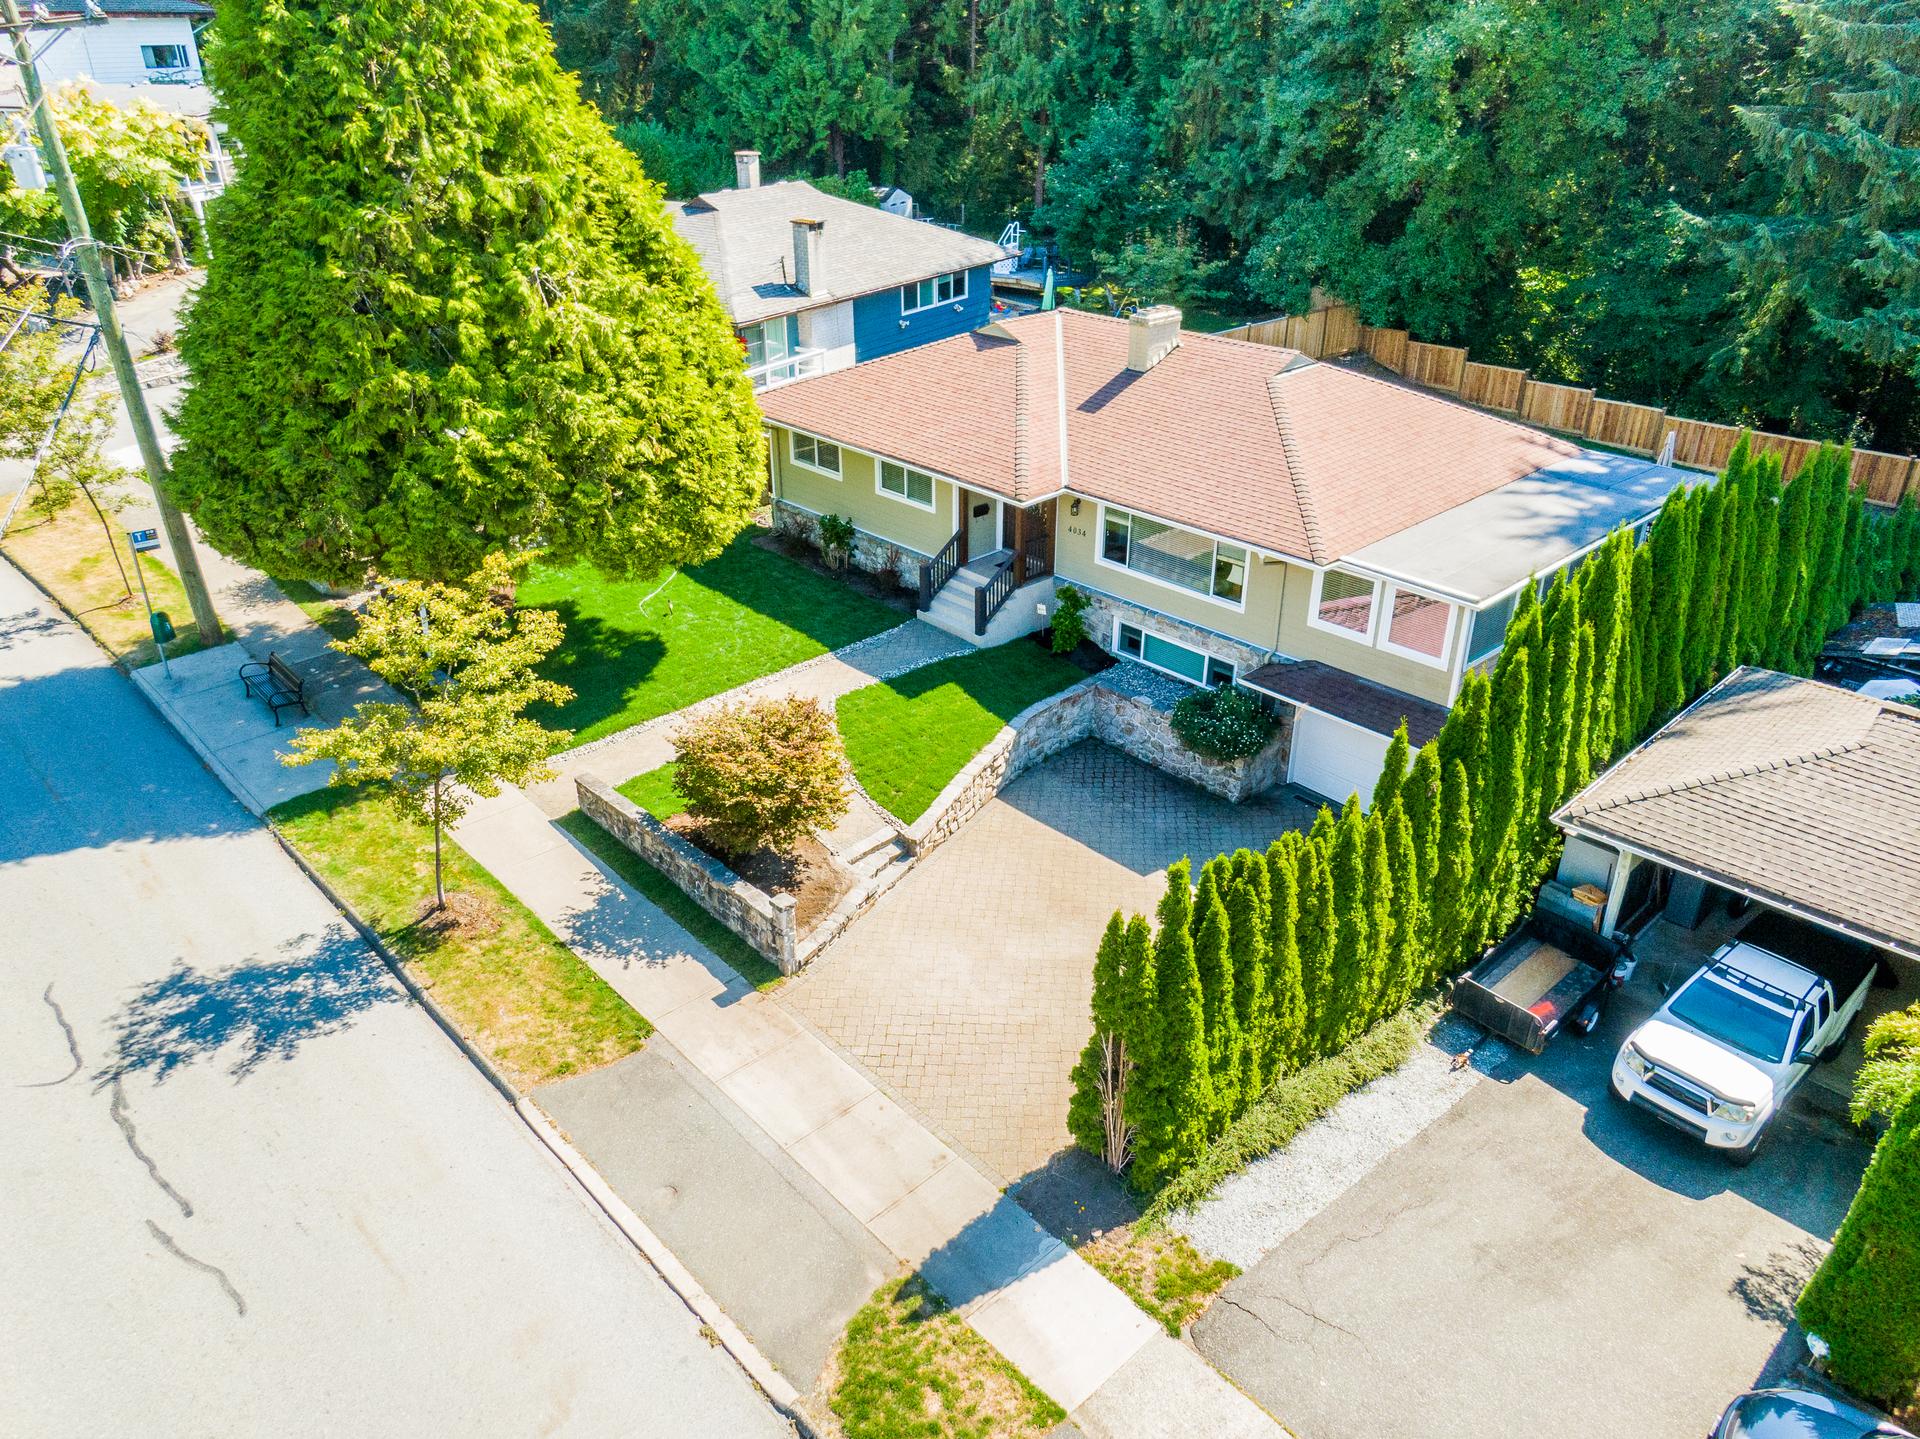 4034-delbrook-avenue-north-vancouver-drone-14 at 4034 Delbrook Avenue, Upper Delbrook, North Vancouver